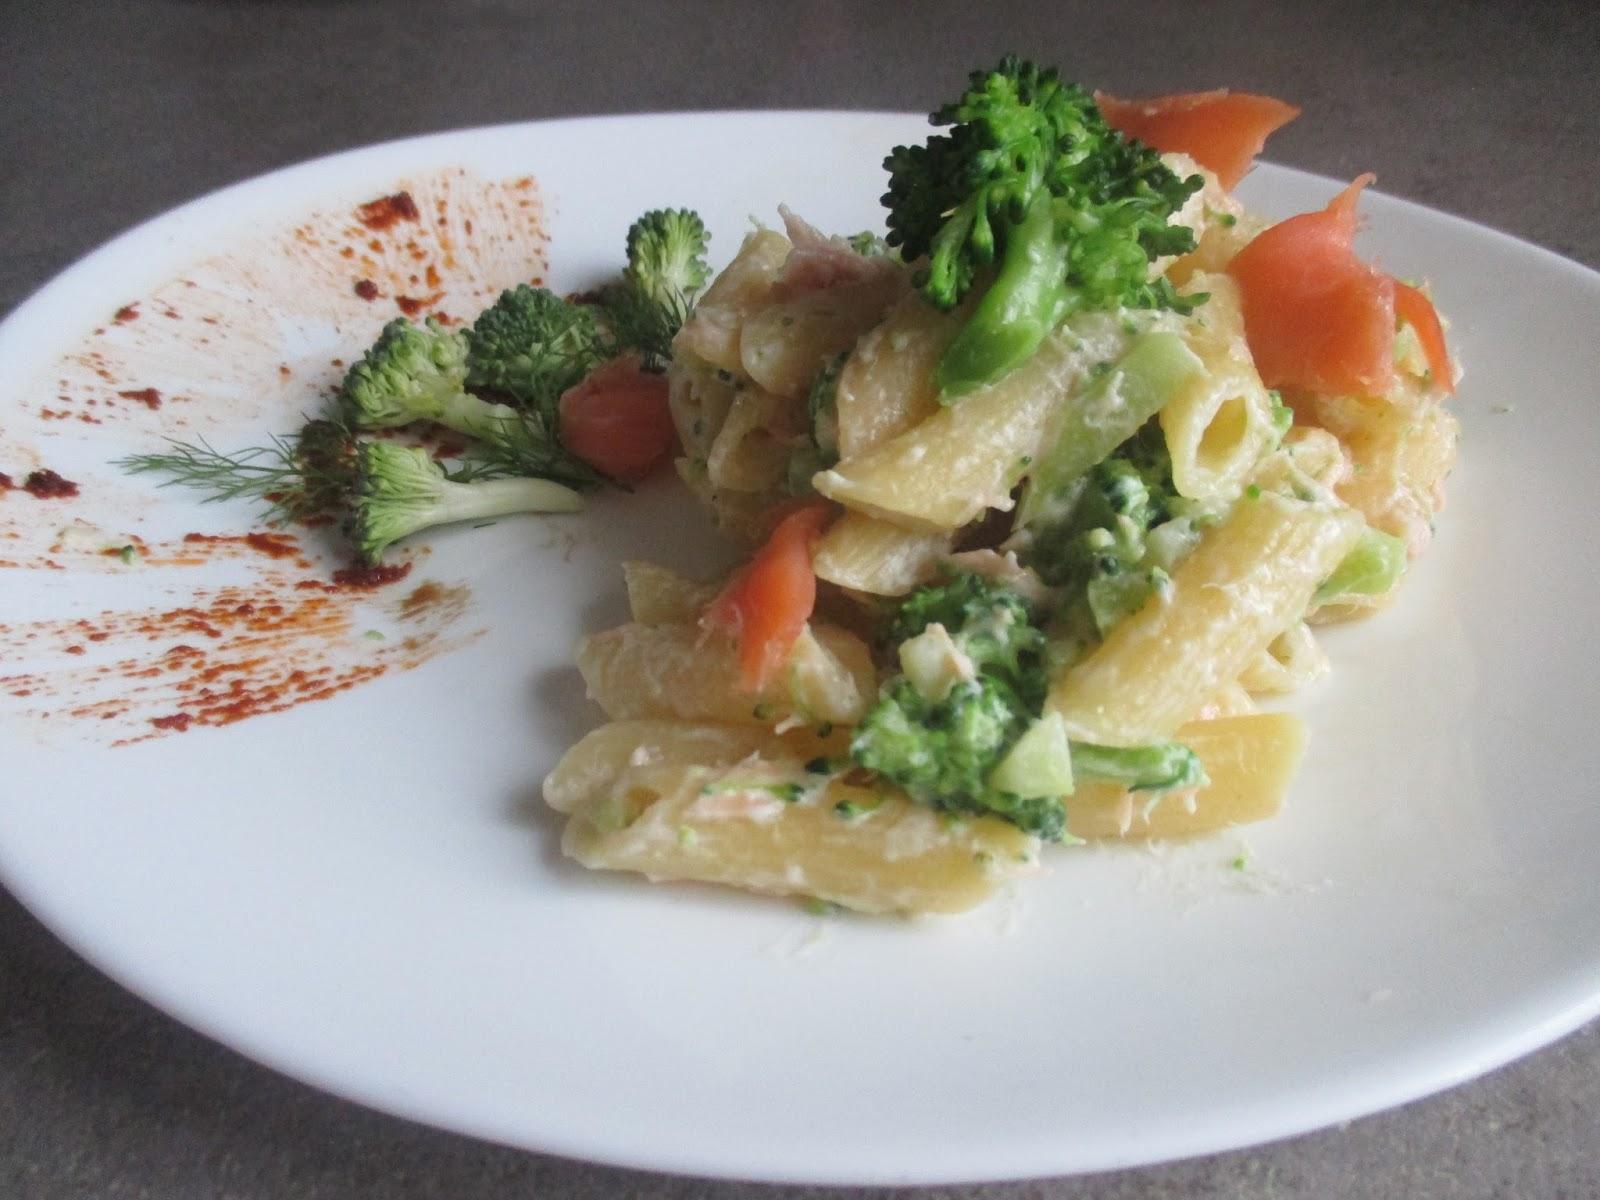 Penne Pasta With Greek Yogurt Smoked Salmon And Broccoli Recette Aussi En Francais Penne Con Yogurt Greco Salmone Affumicato E Broccoli